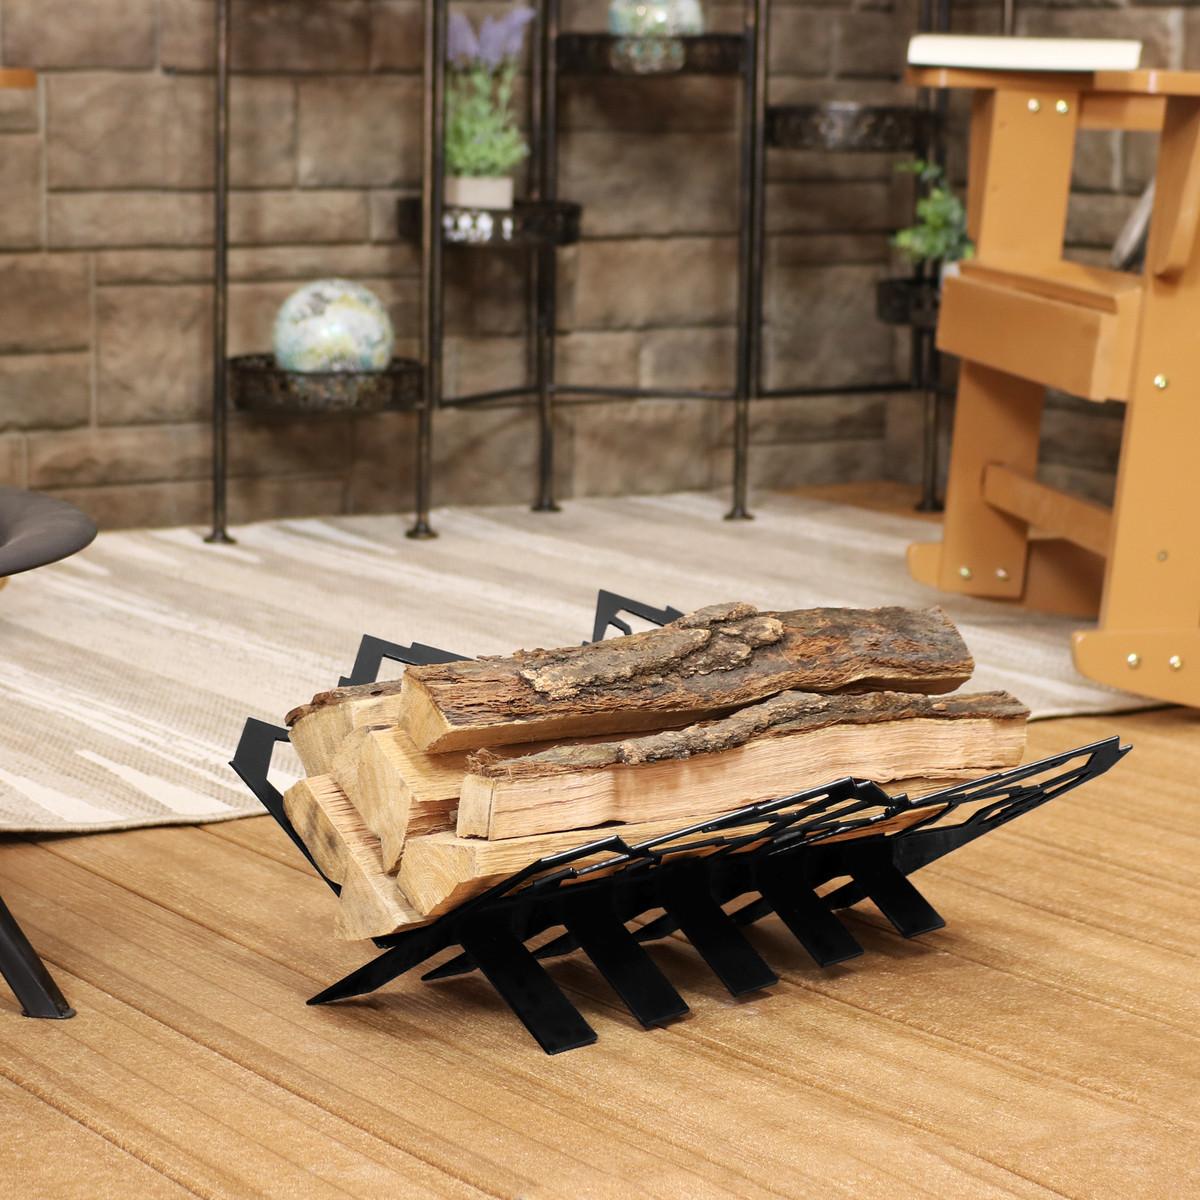 Sunnydaze Small Mountainside Indoor Outdoor Fireplace Firewood Log